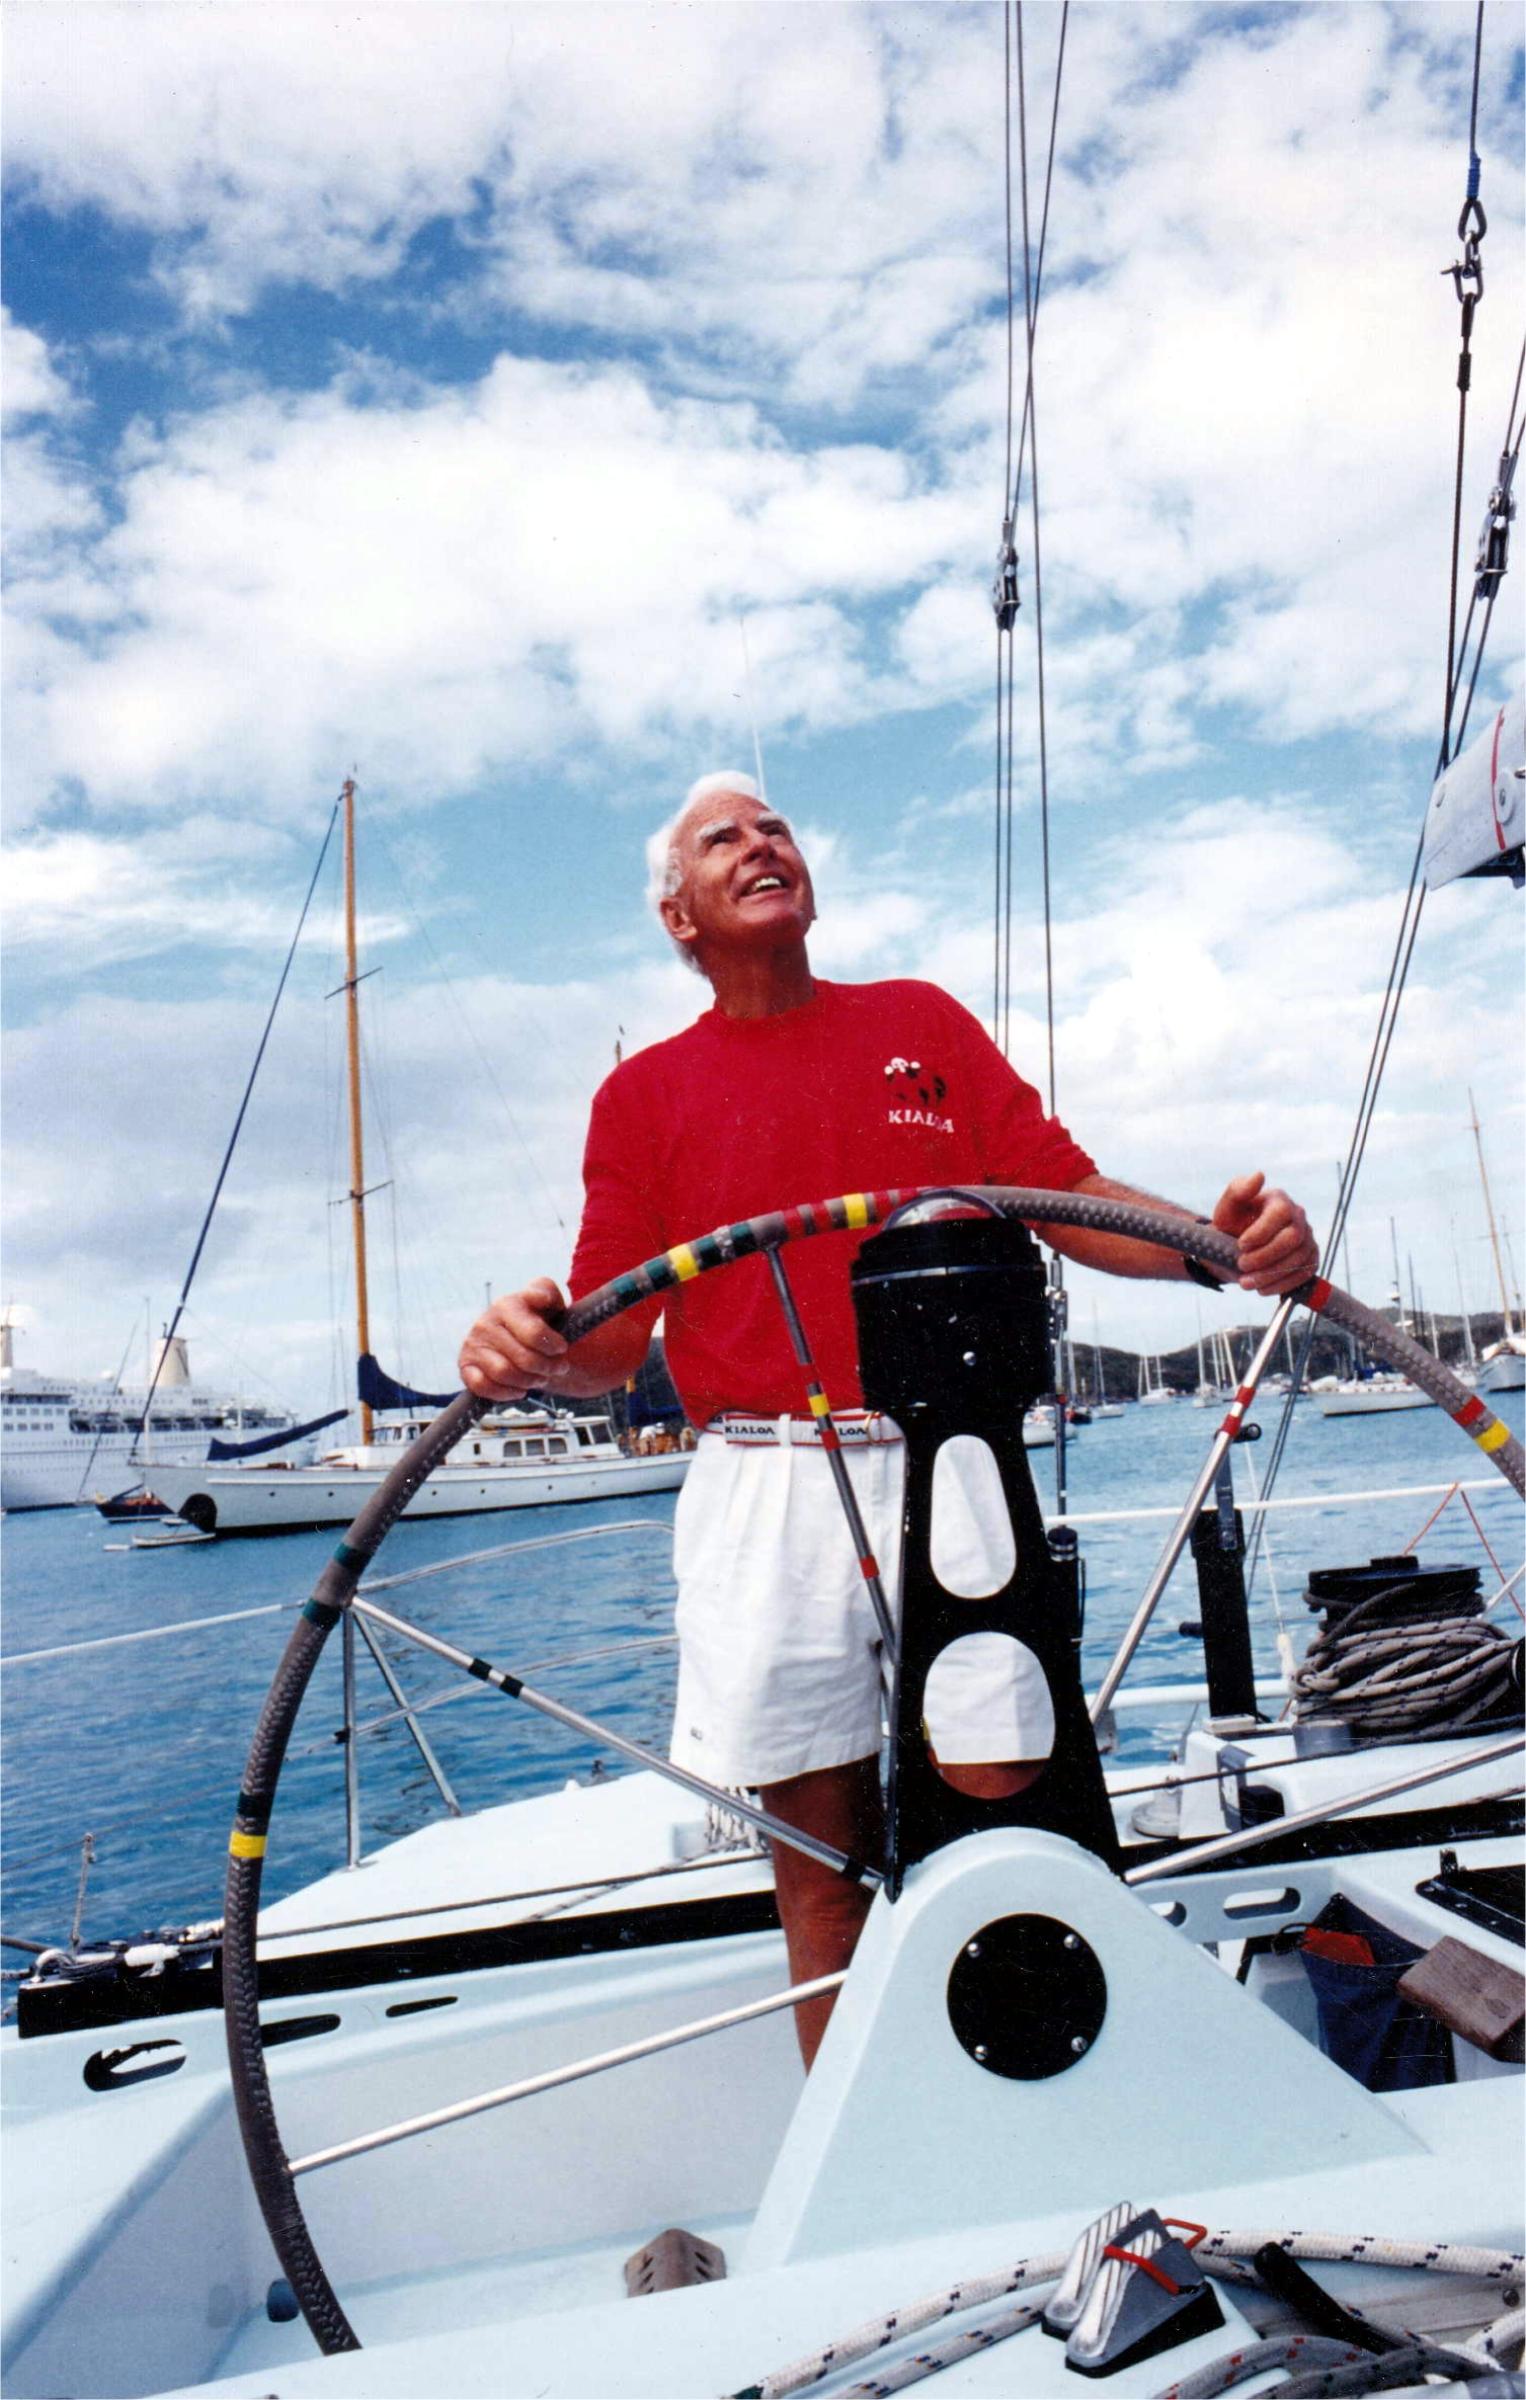 The Skipper, John (Jim) Kilroy